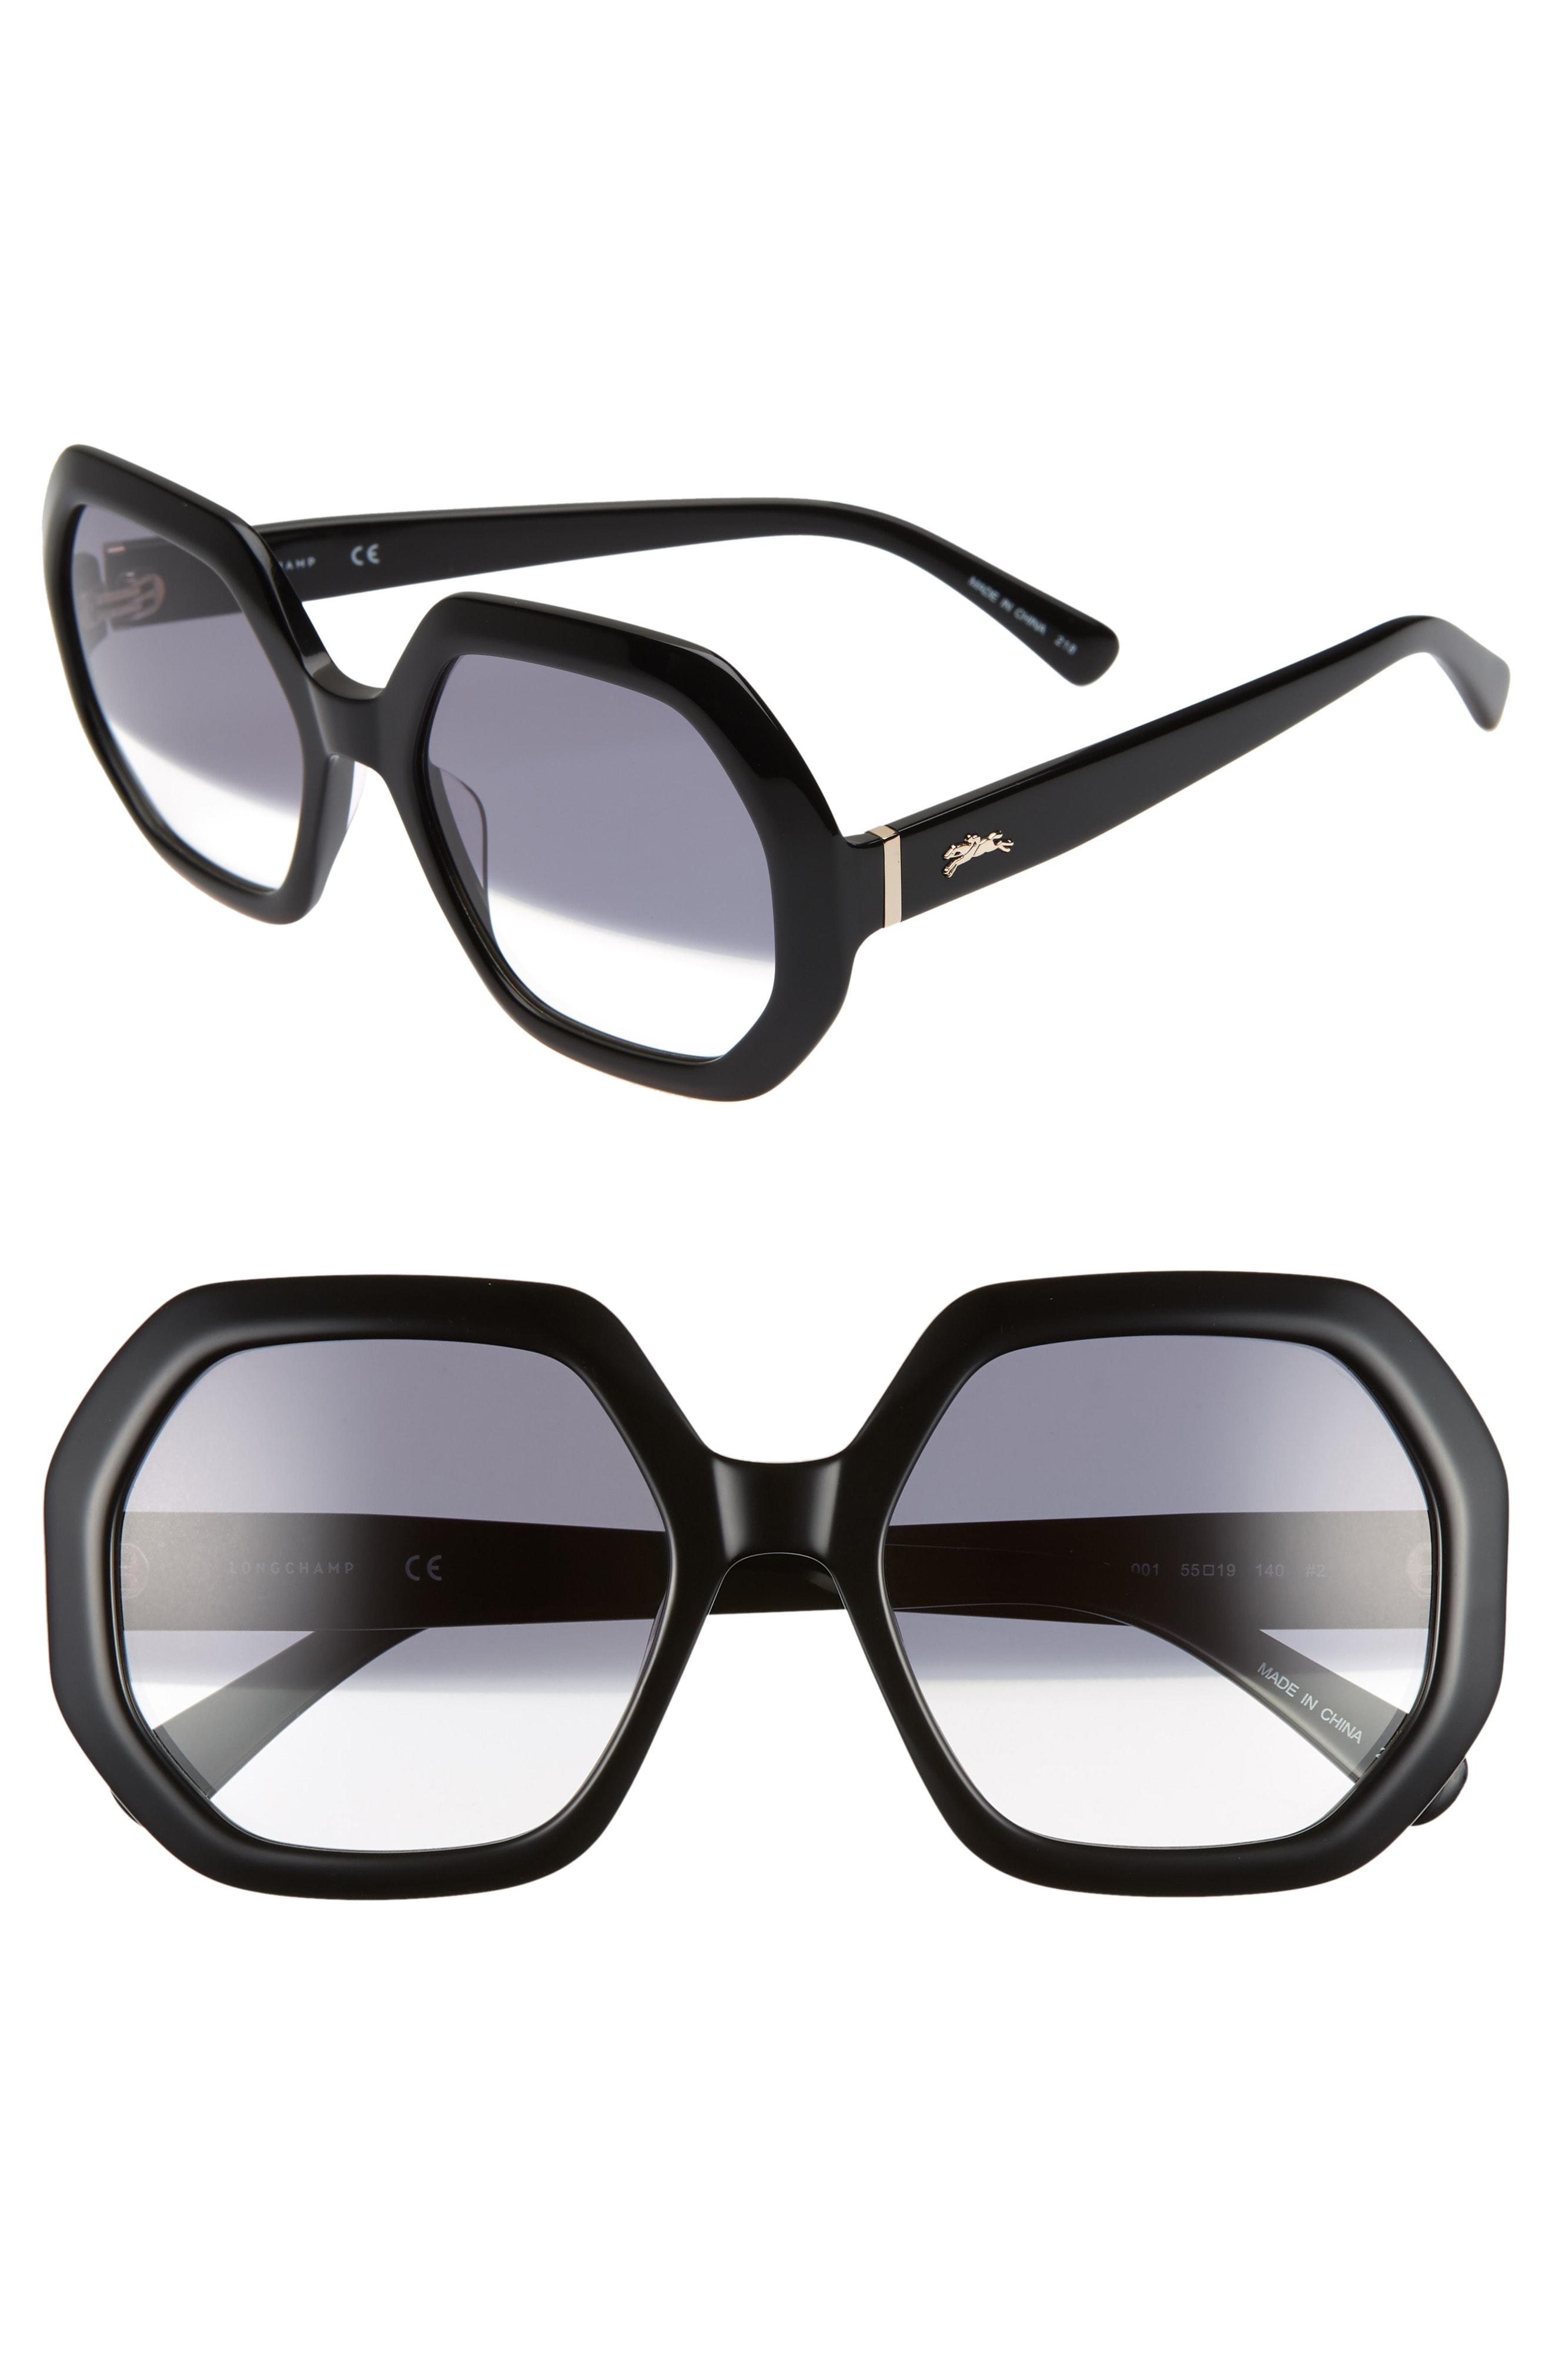 7f39b6673ad Longchamp - Black Heritage 55mm Gradient Lens Geometric Sunglasses - Lyst.  View fullscreen